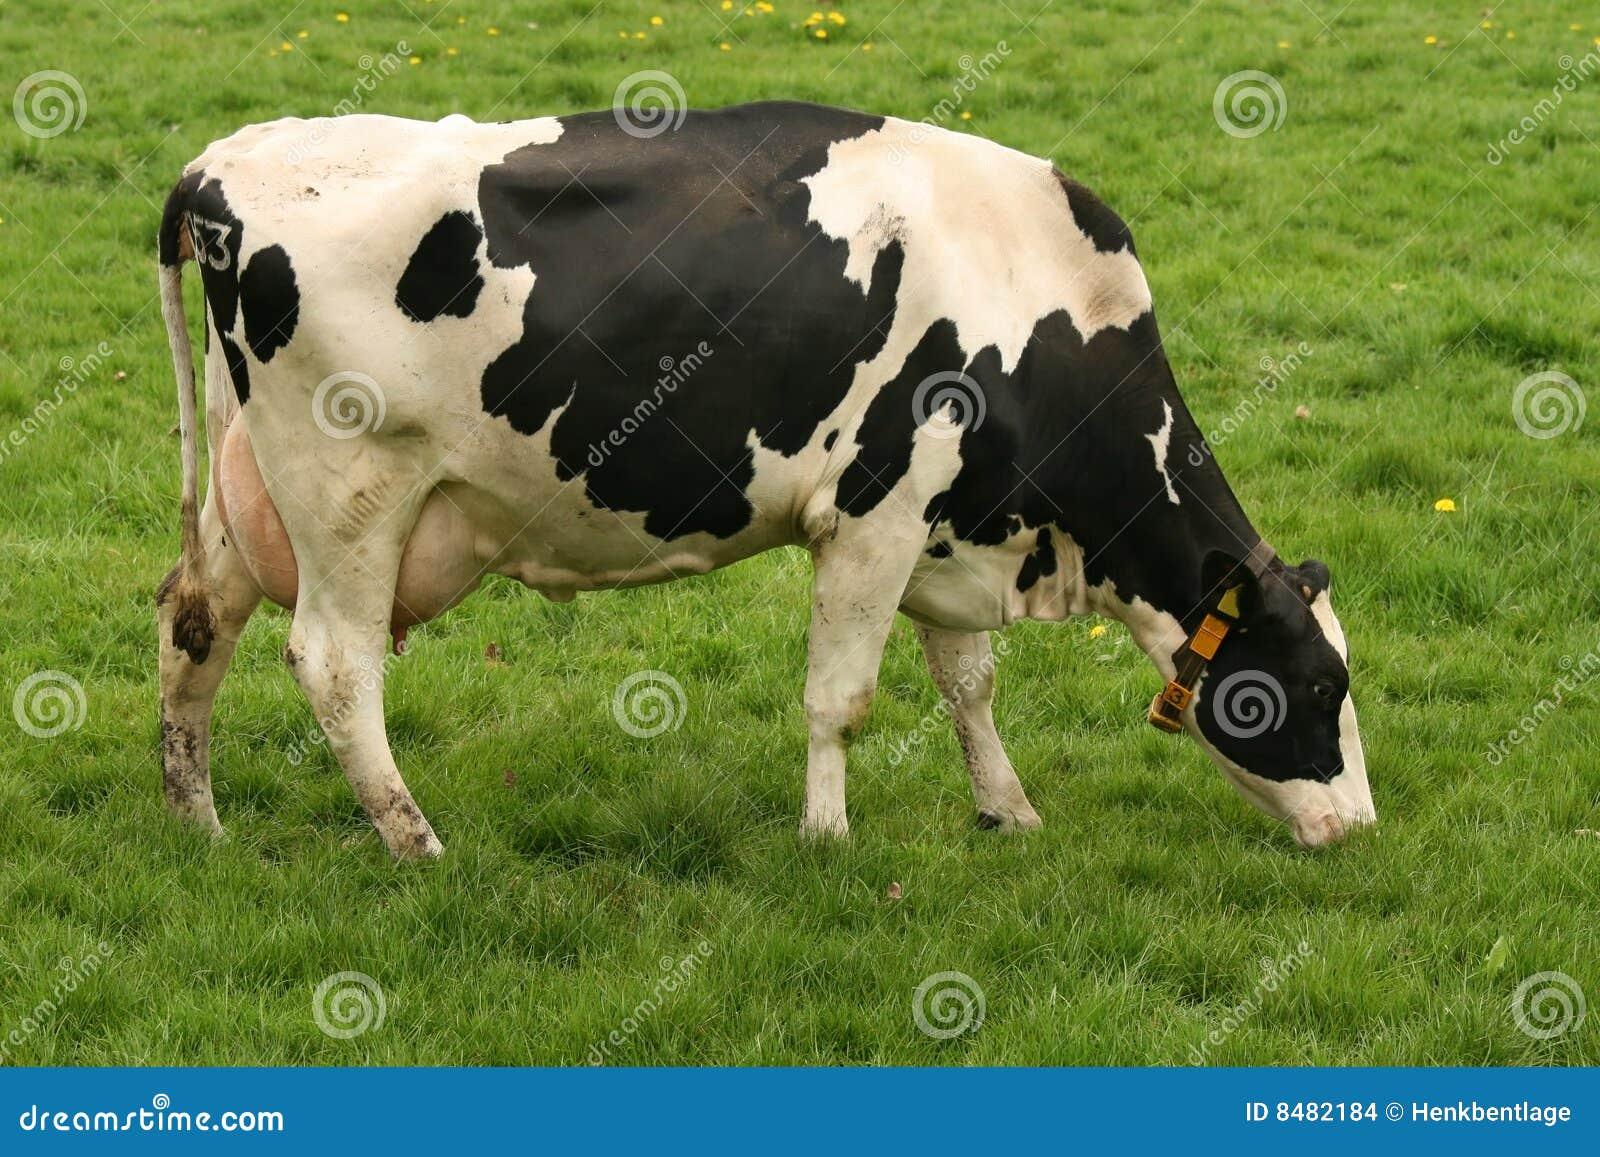 : cow, cattle, livestock, animal, farm animal, grass, green, black ...